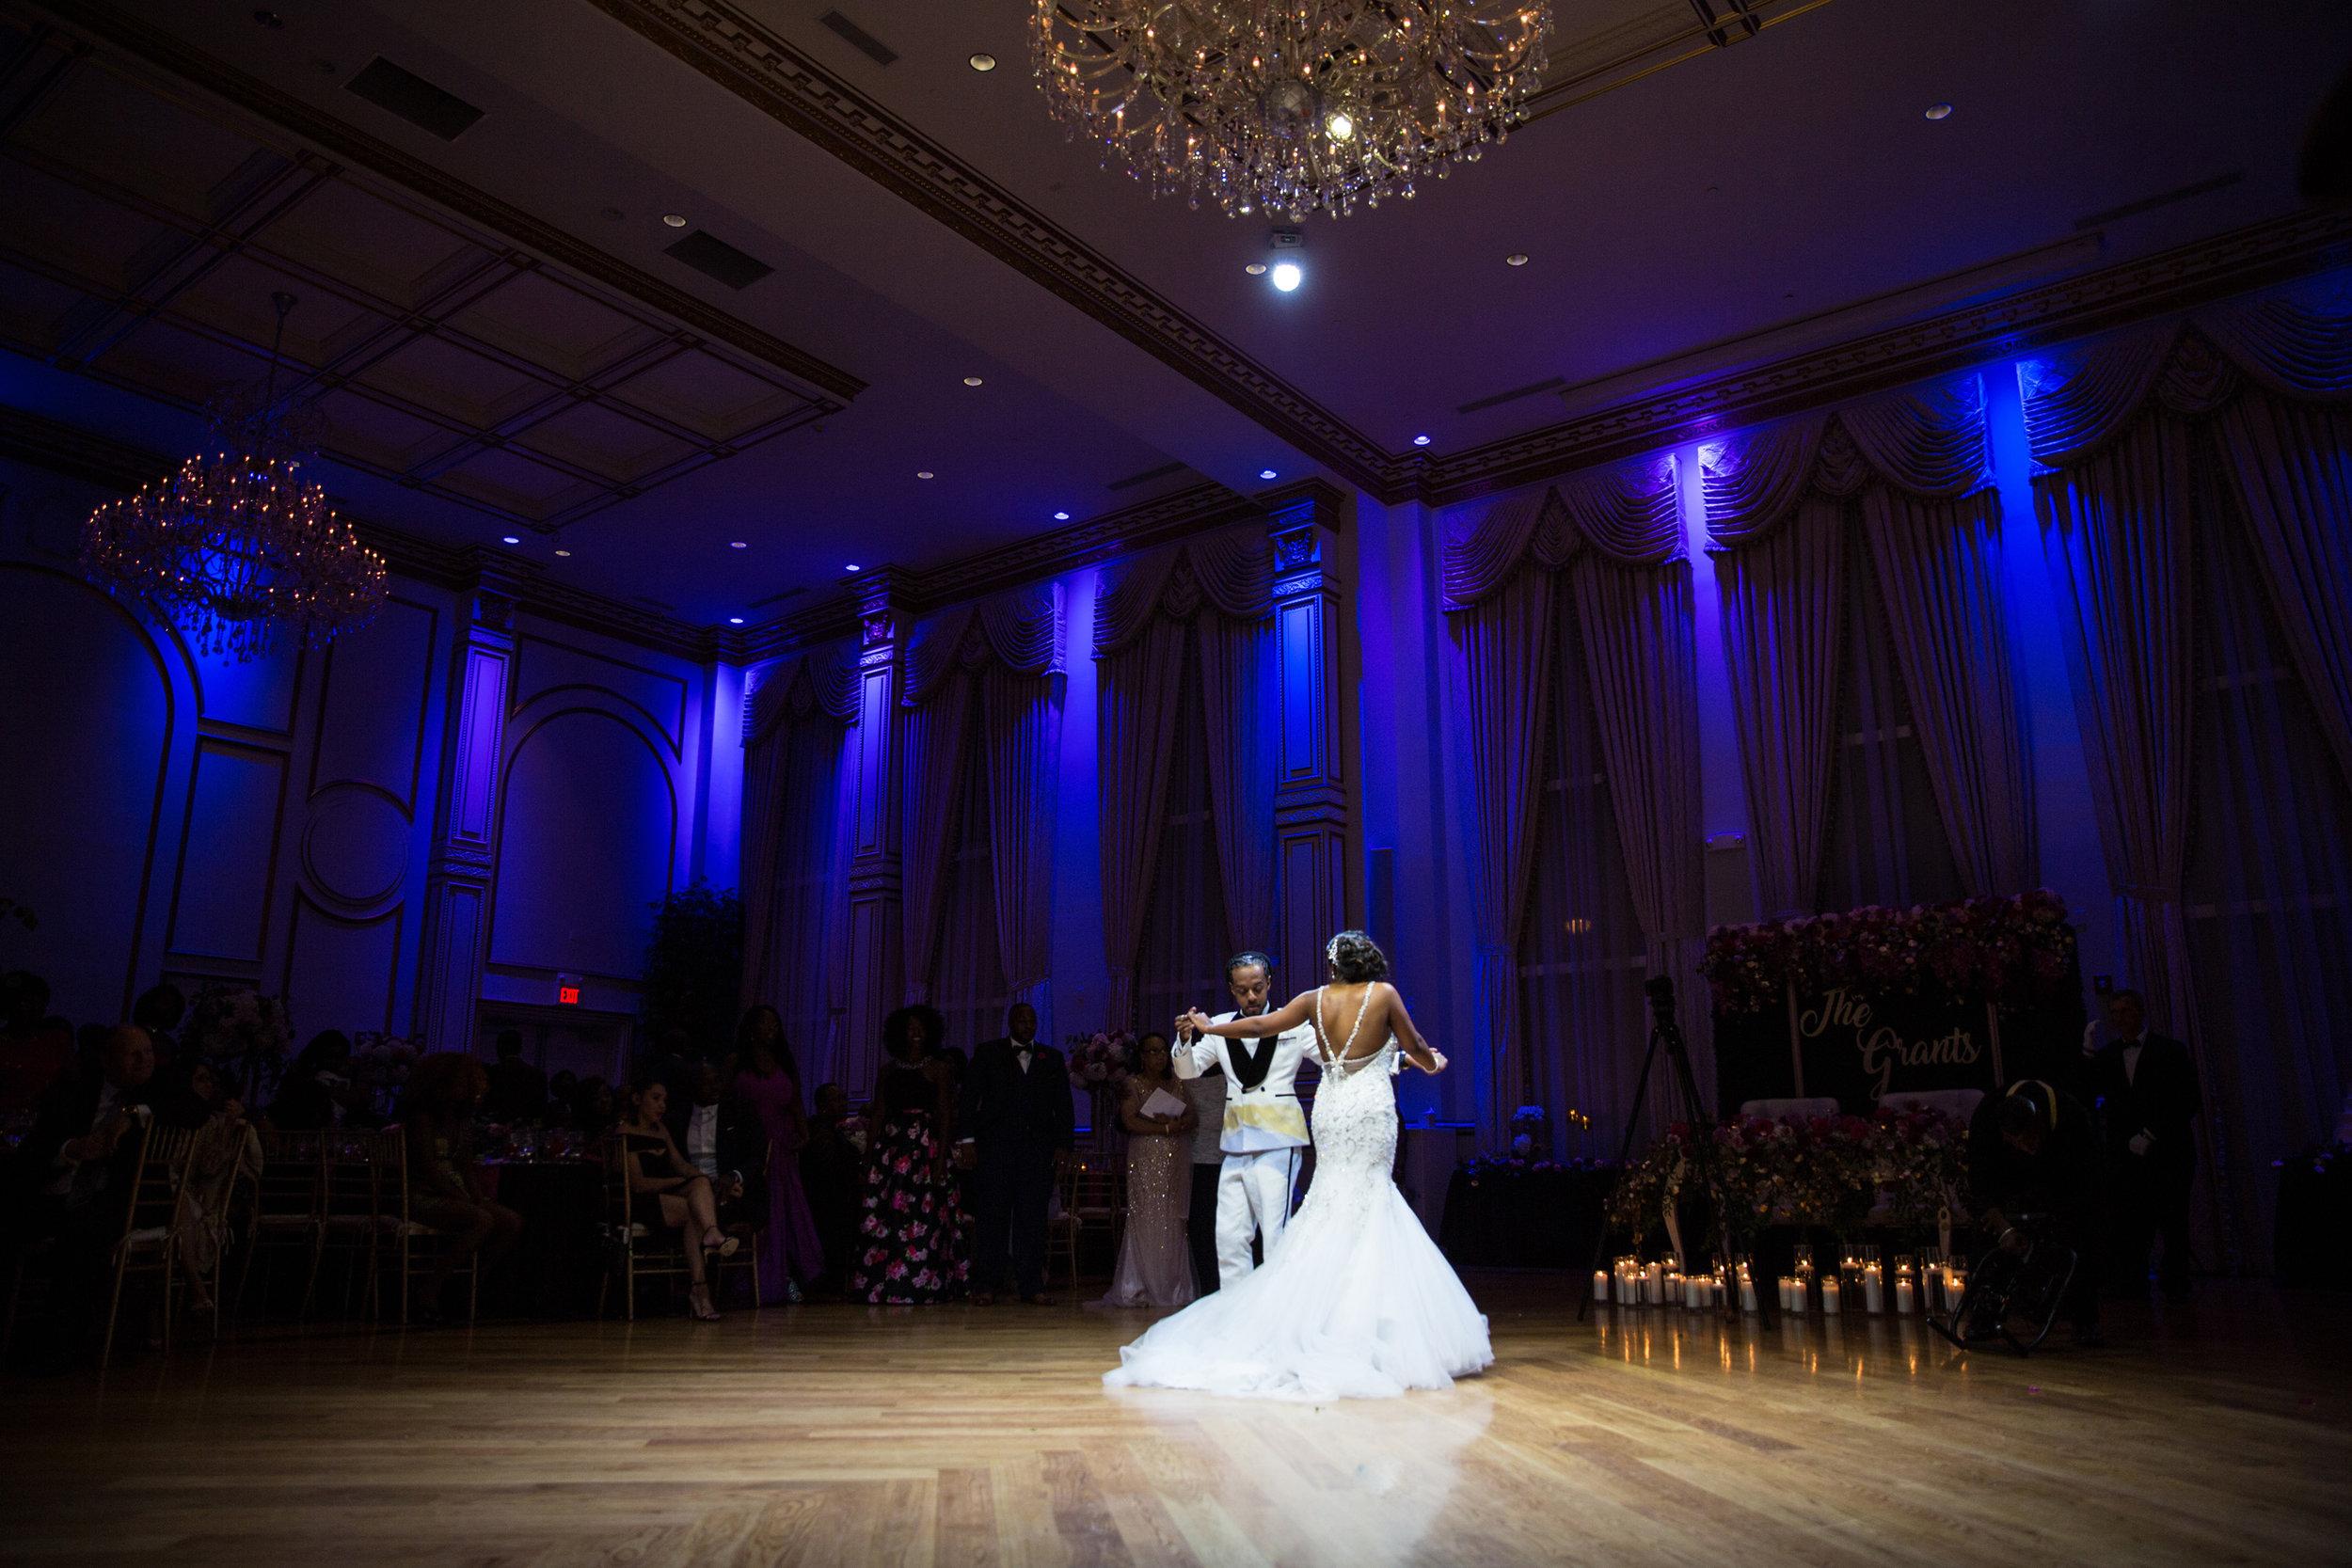 victorious-events-nyc-027-romie-kamali-tides-estate-wedding-nana-annan.jpg